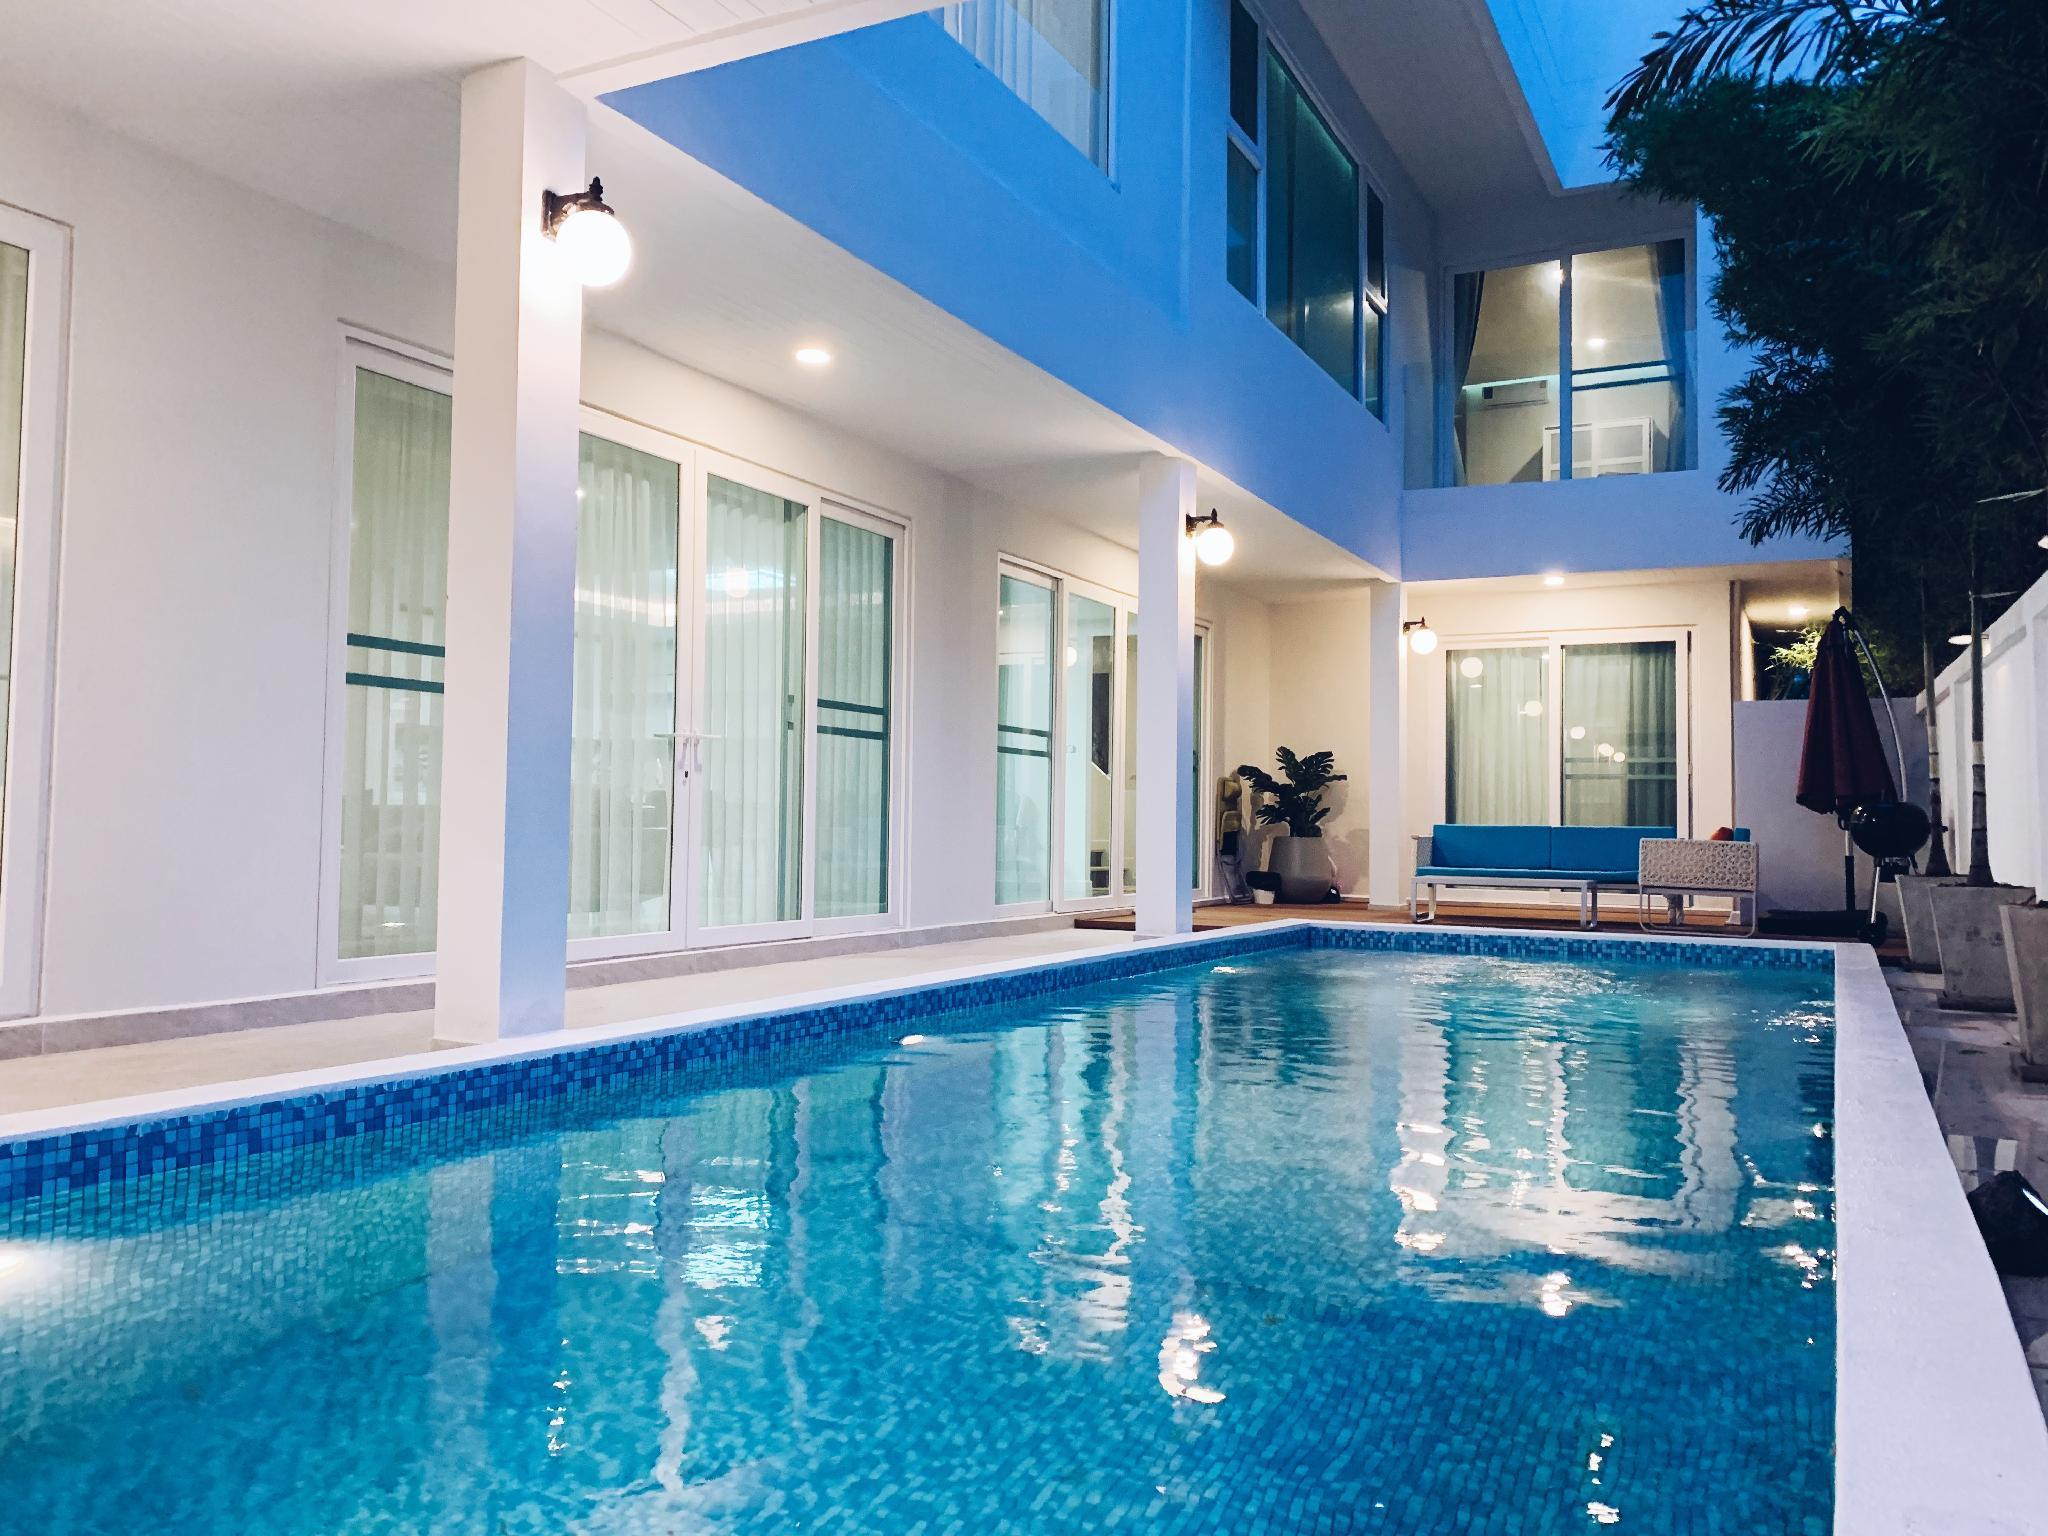 Luxury pool/nightmarket/bar/massage/barbecue/beach วิลลา 5 ห้องนอน 6 ห้องน้ำส่วนตัว ขนาด 600 ตร.ม. – หาดจอมเทียน